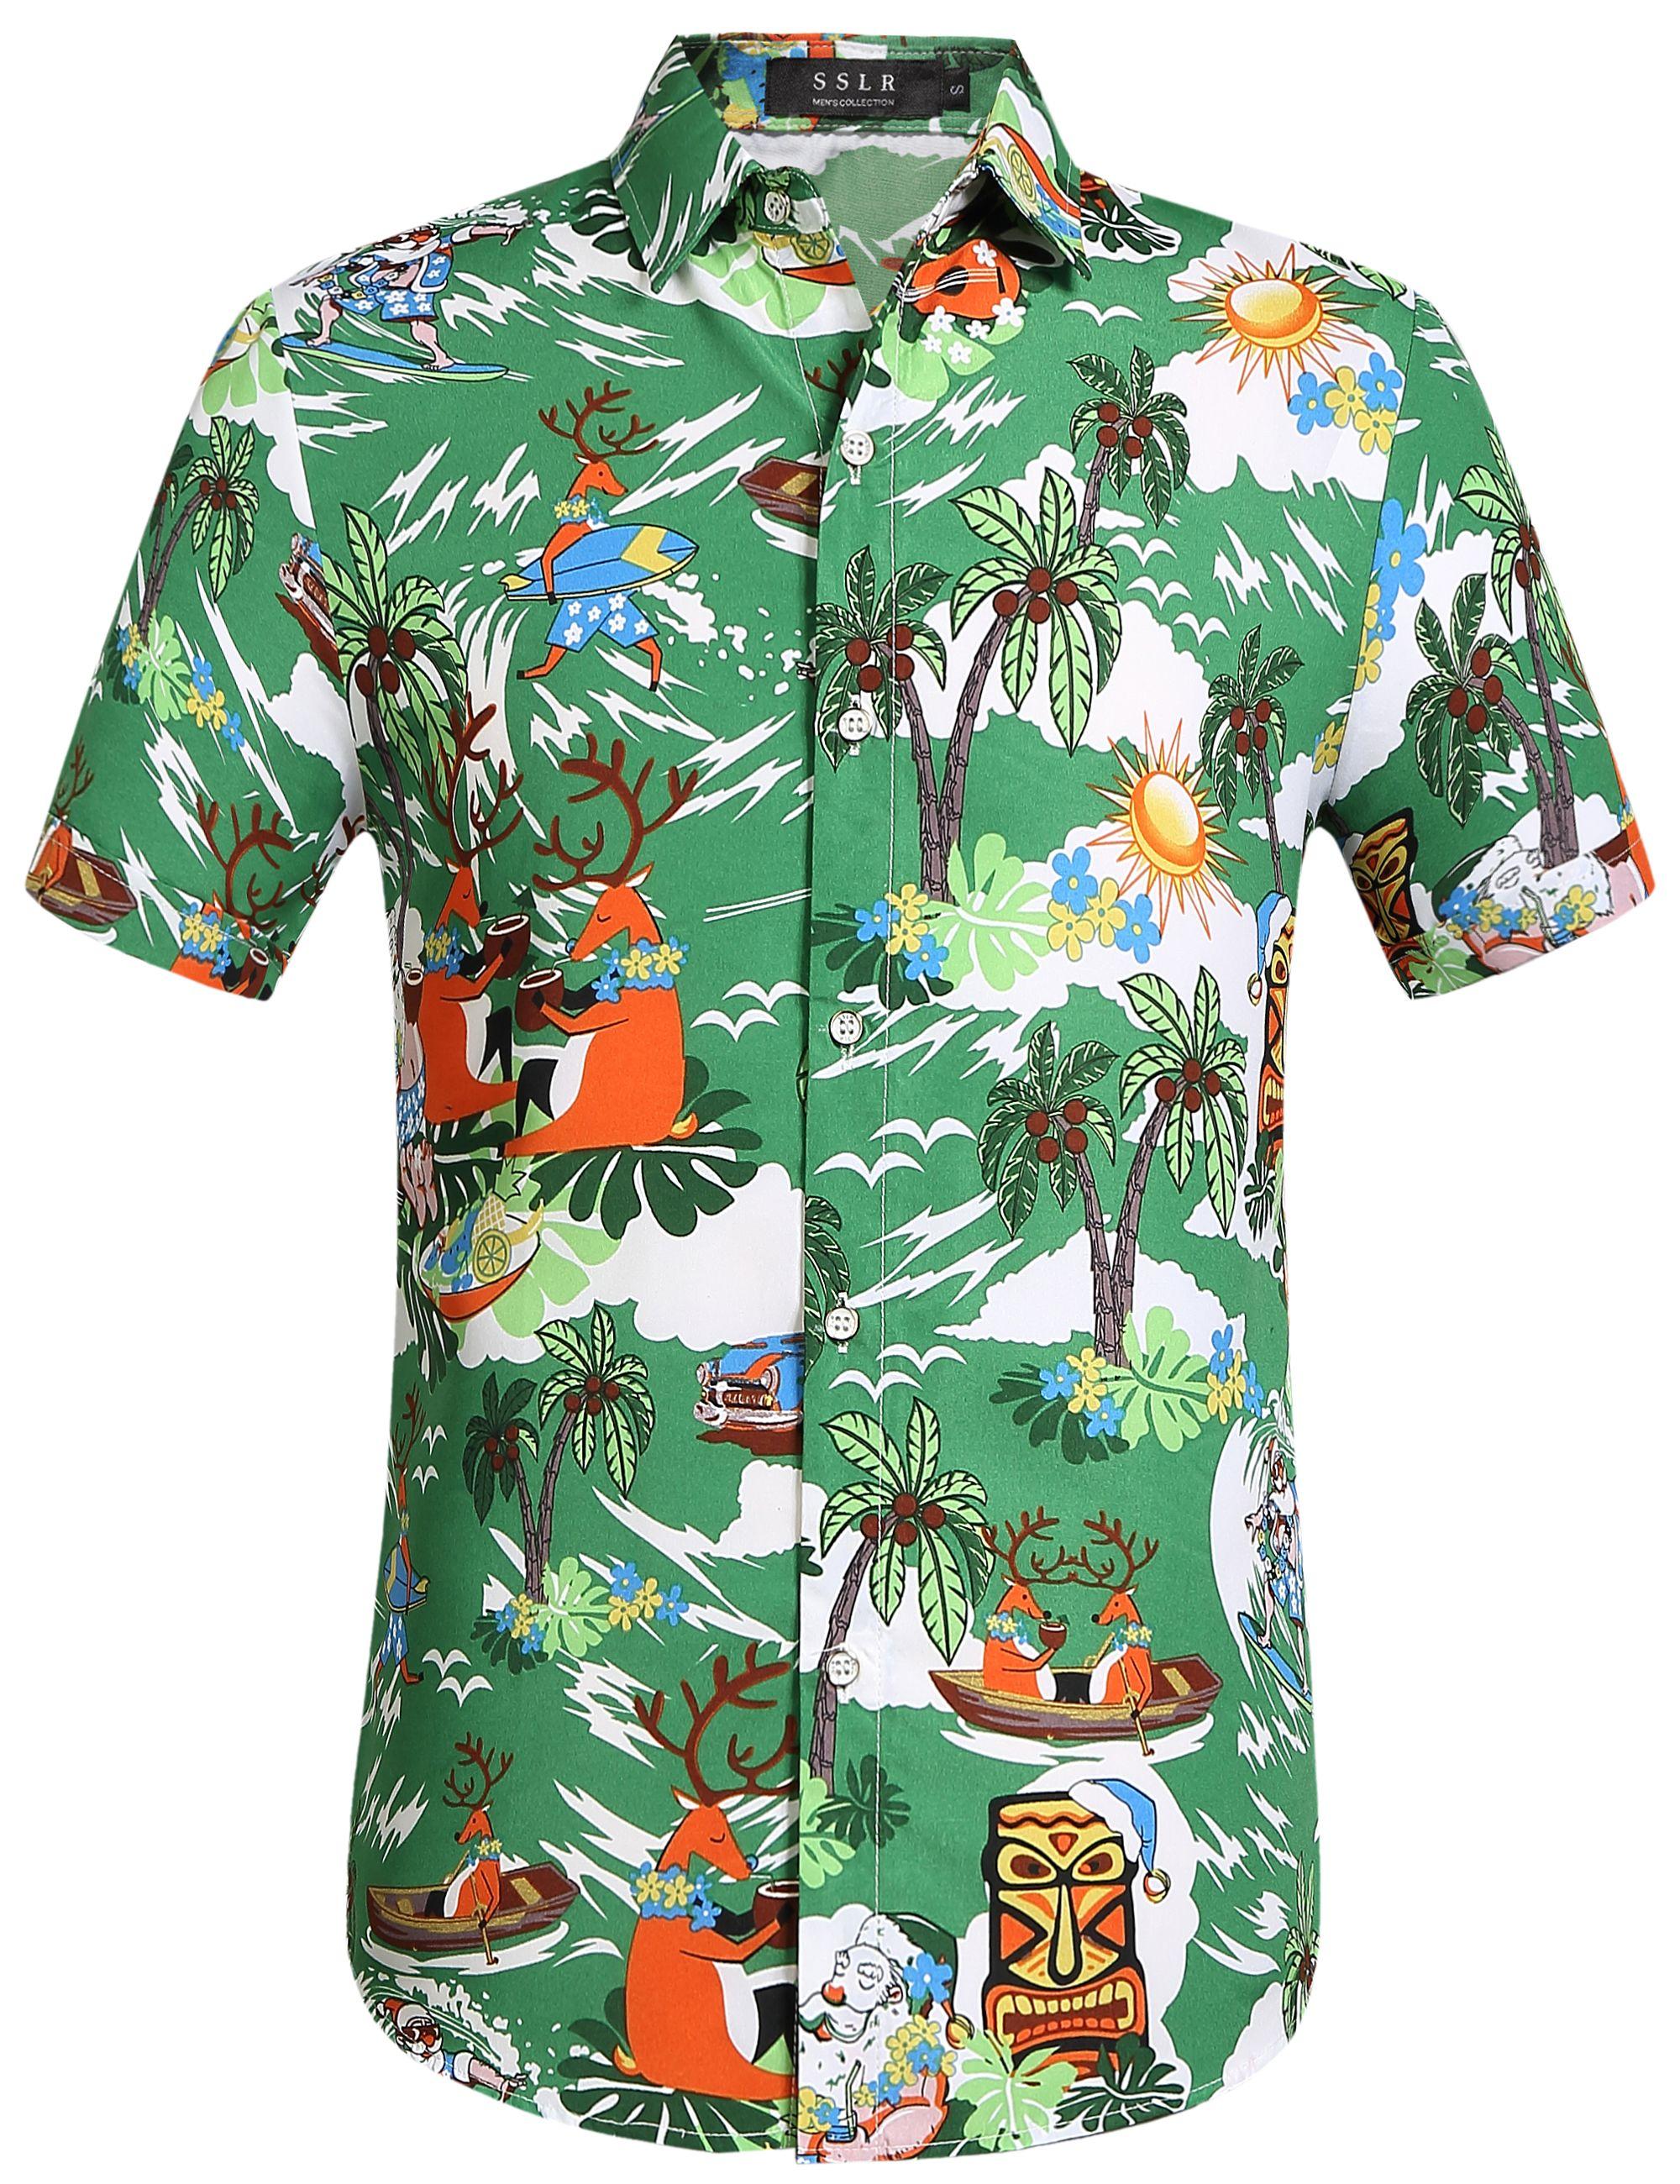 Christmas Hawaiian Shirts.19 00 Reindeer Hawaiian Shirt Christmas Party Outfit Lime